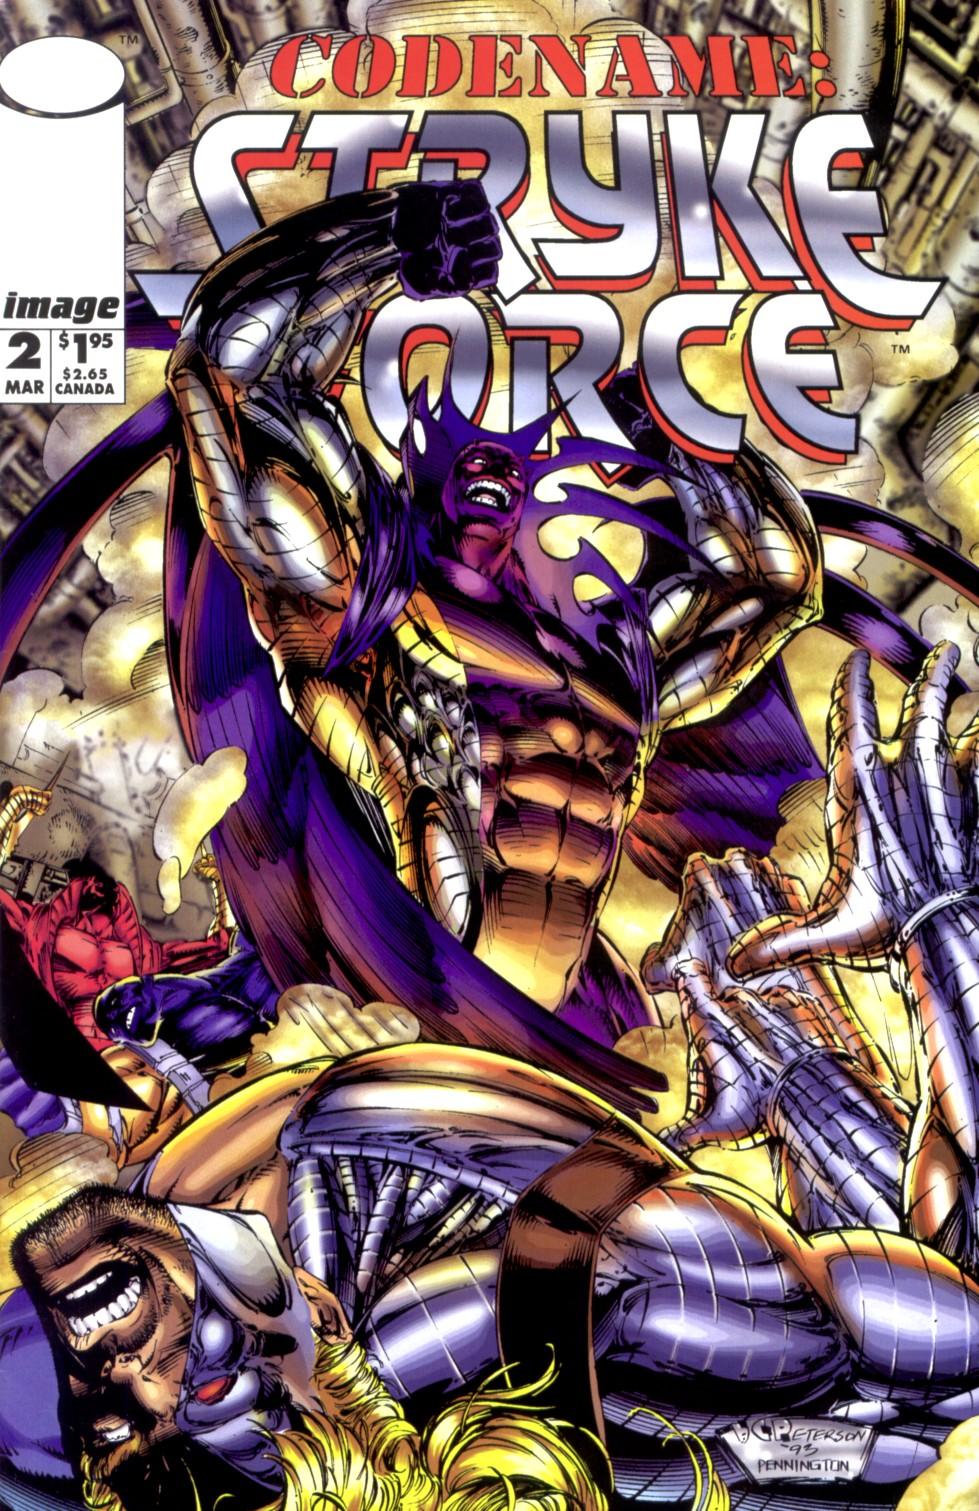 Codename: Stryke Force Vol 1 2